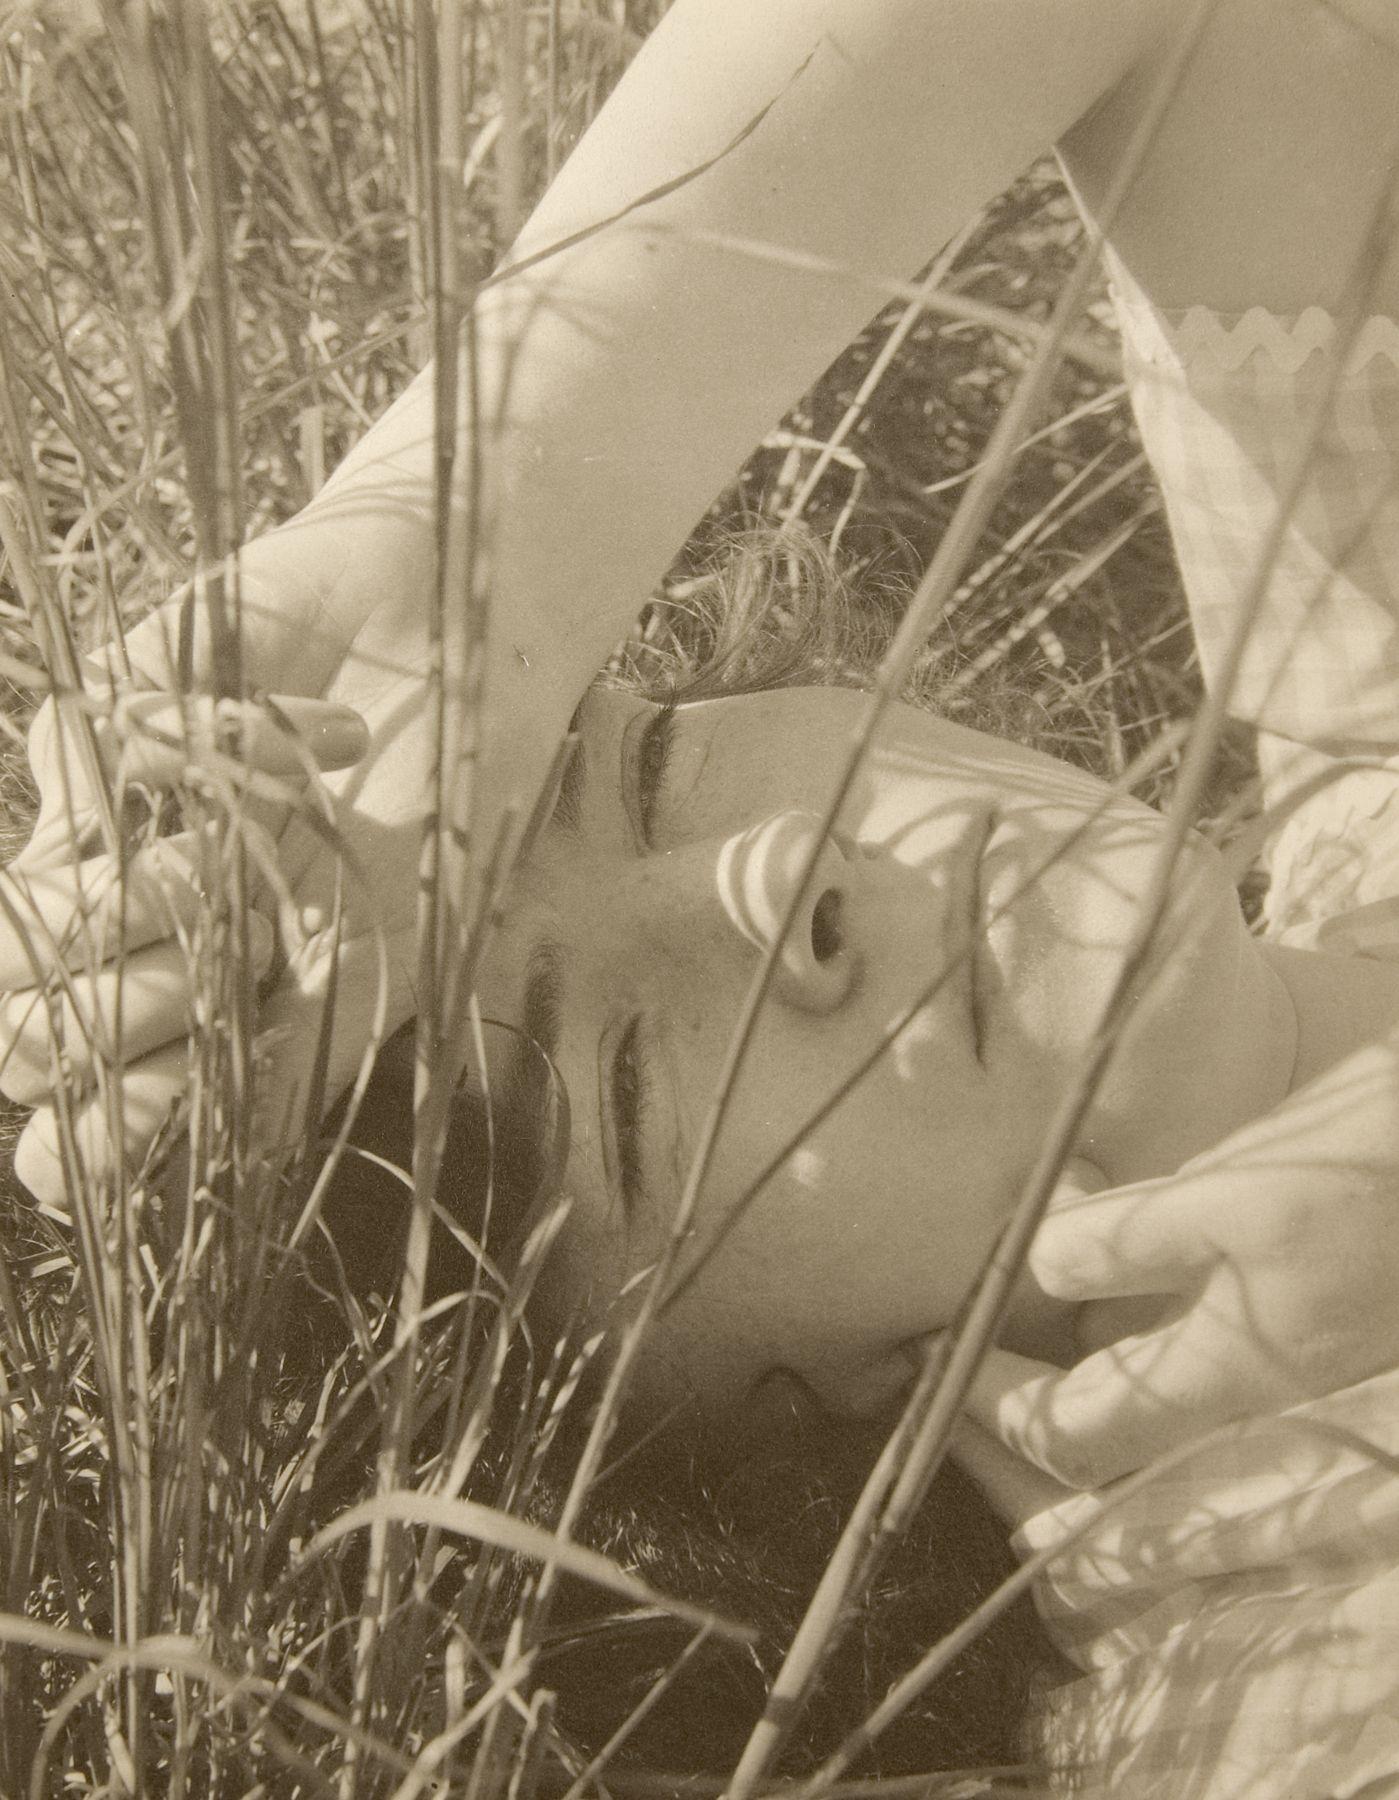 Edward Steichen: 1915-1923 2009 Howard Greenberg Gallery